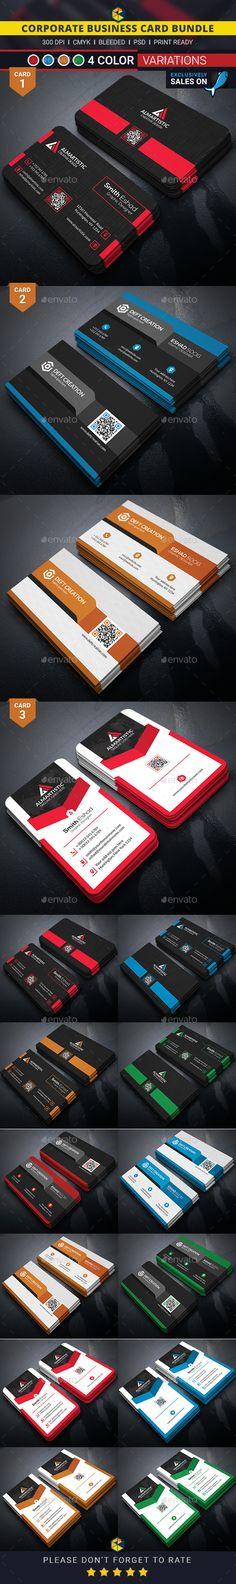 Corporate Business Card Bundle Template #design Buy Now: http://graphicriver.net/item/corporate-business-card-bundle/12780364?ref=ksioks